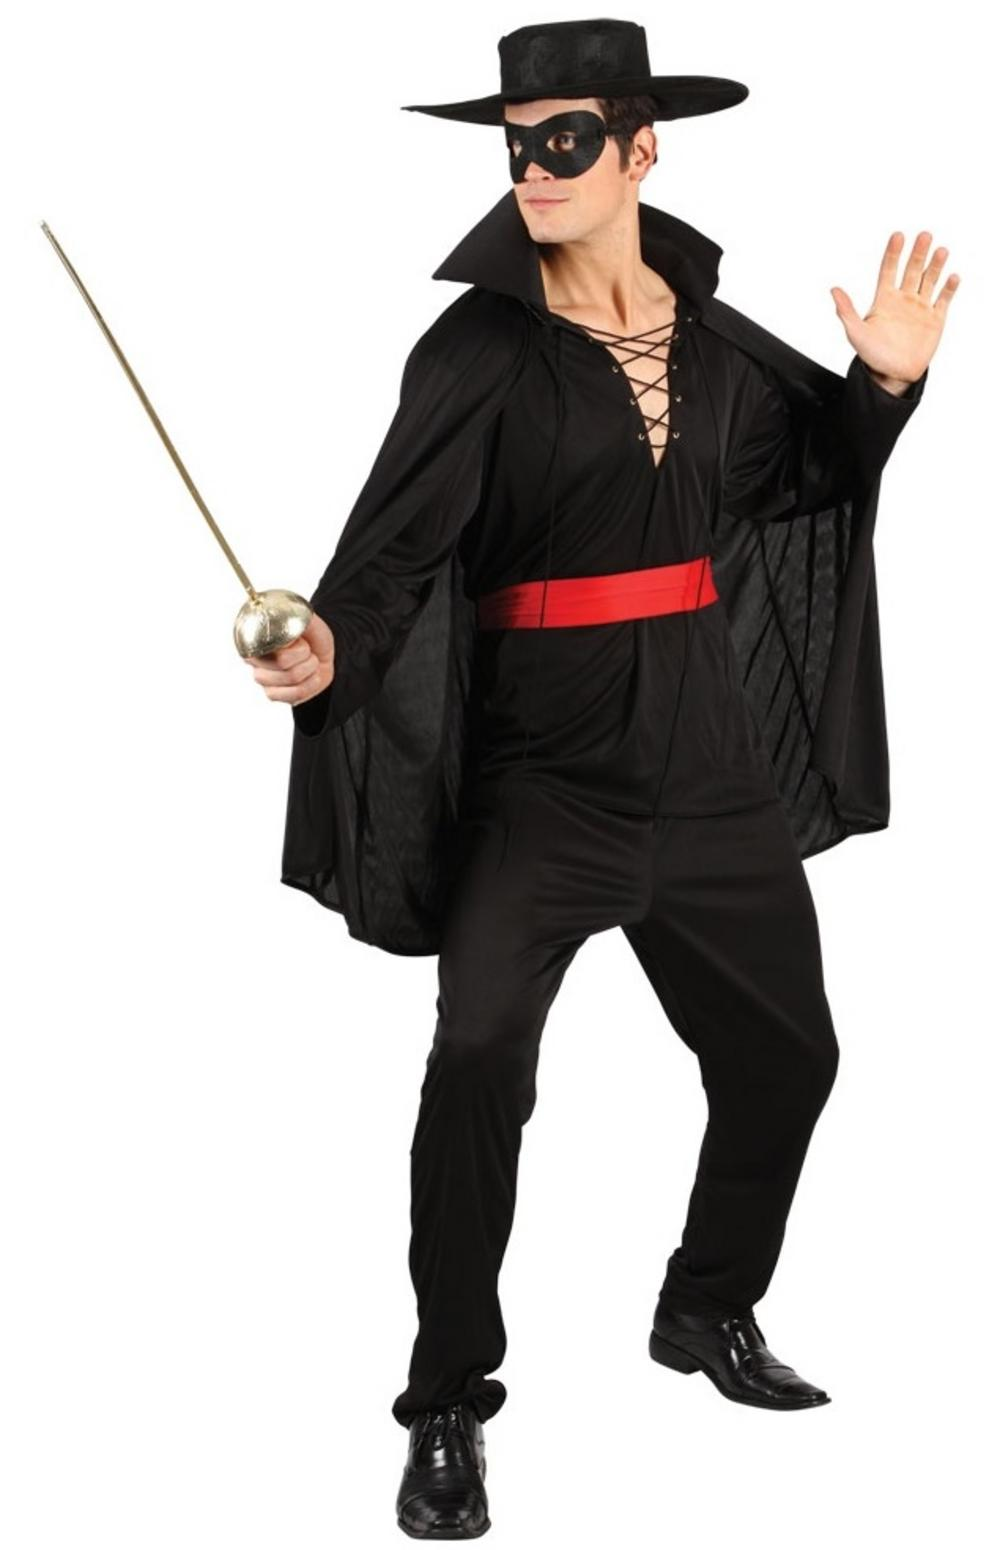 Bandit Hero Costume | TV, Book and Film Costumes